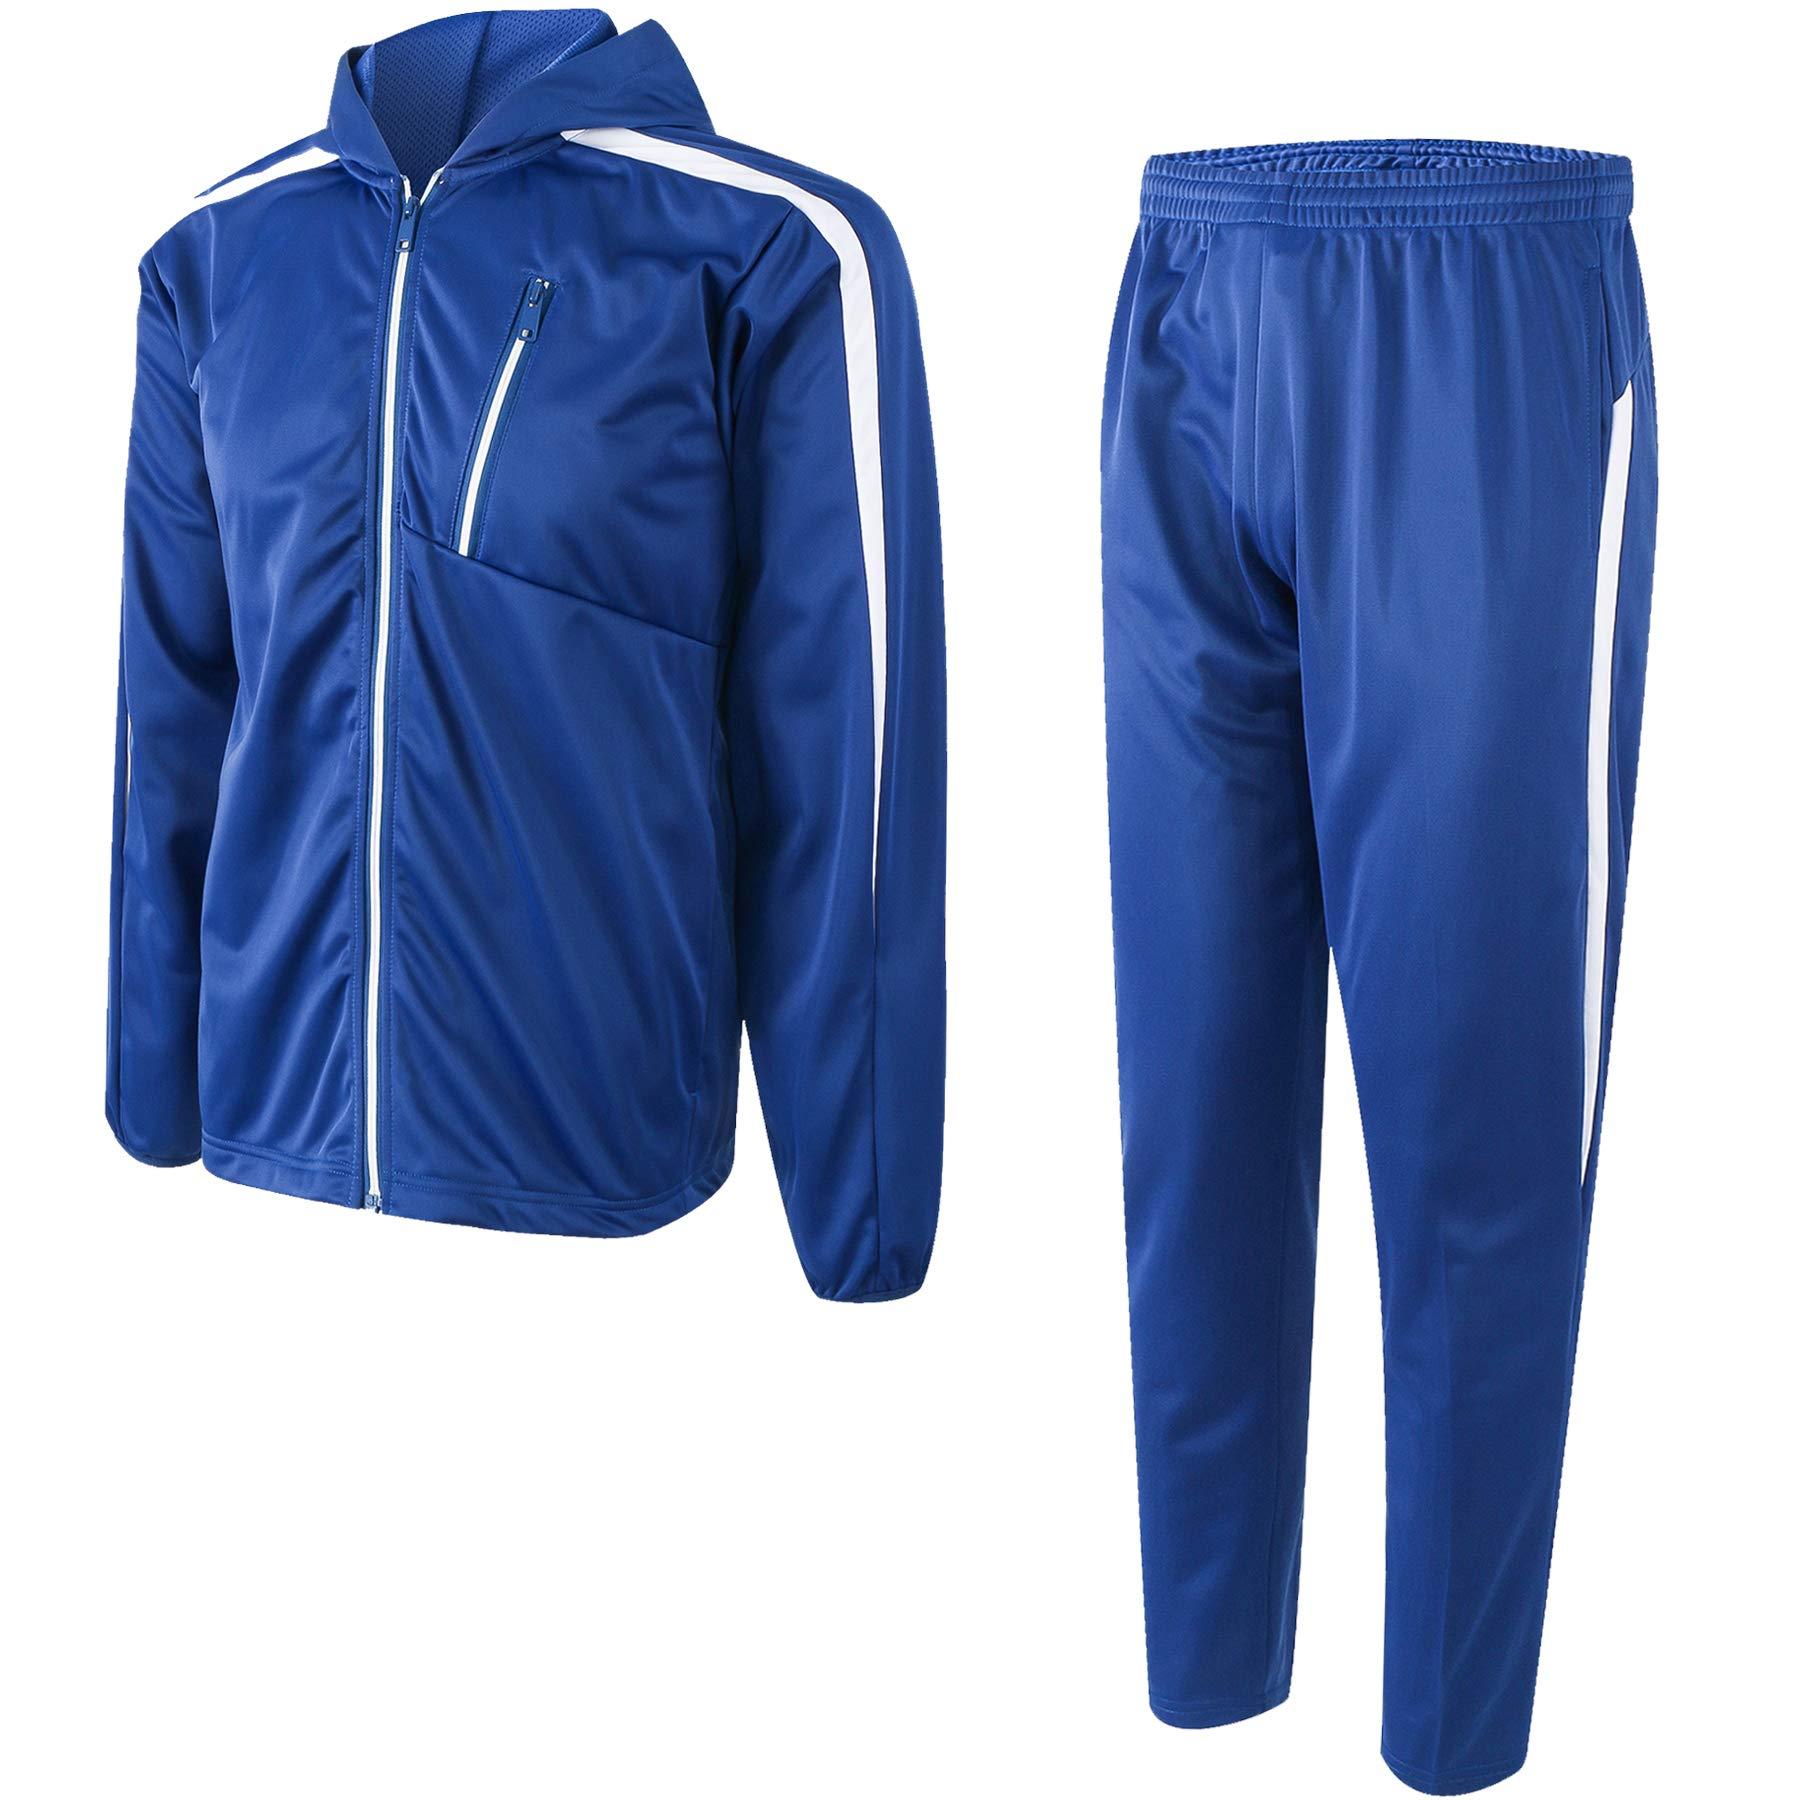 URBEX Mens Athletic 2 Piece Tracksuit Set Hooded Jacket and Sport Pants Long Sleeve Jacket Casual Loose Sweatshirt Drawstring Hoodie-Blu-M by URBEX